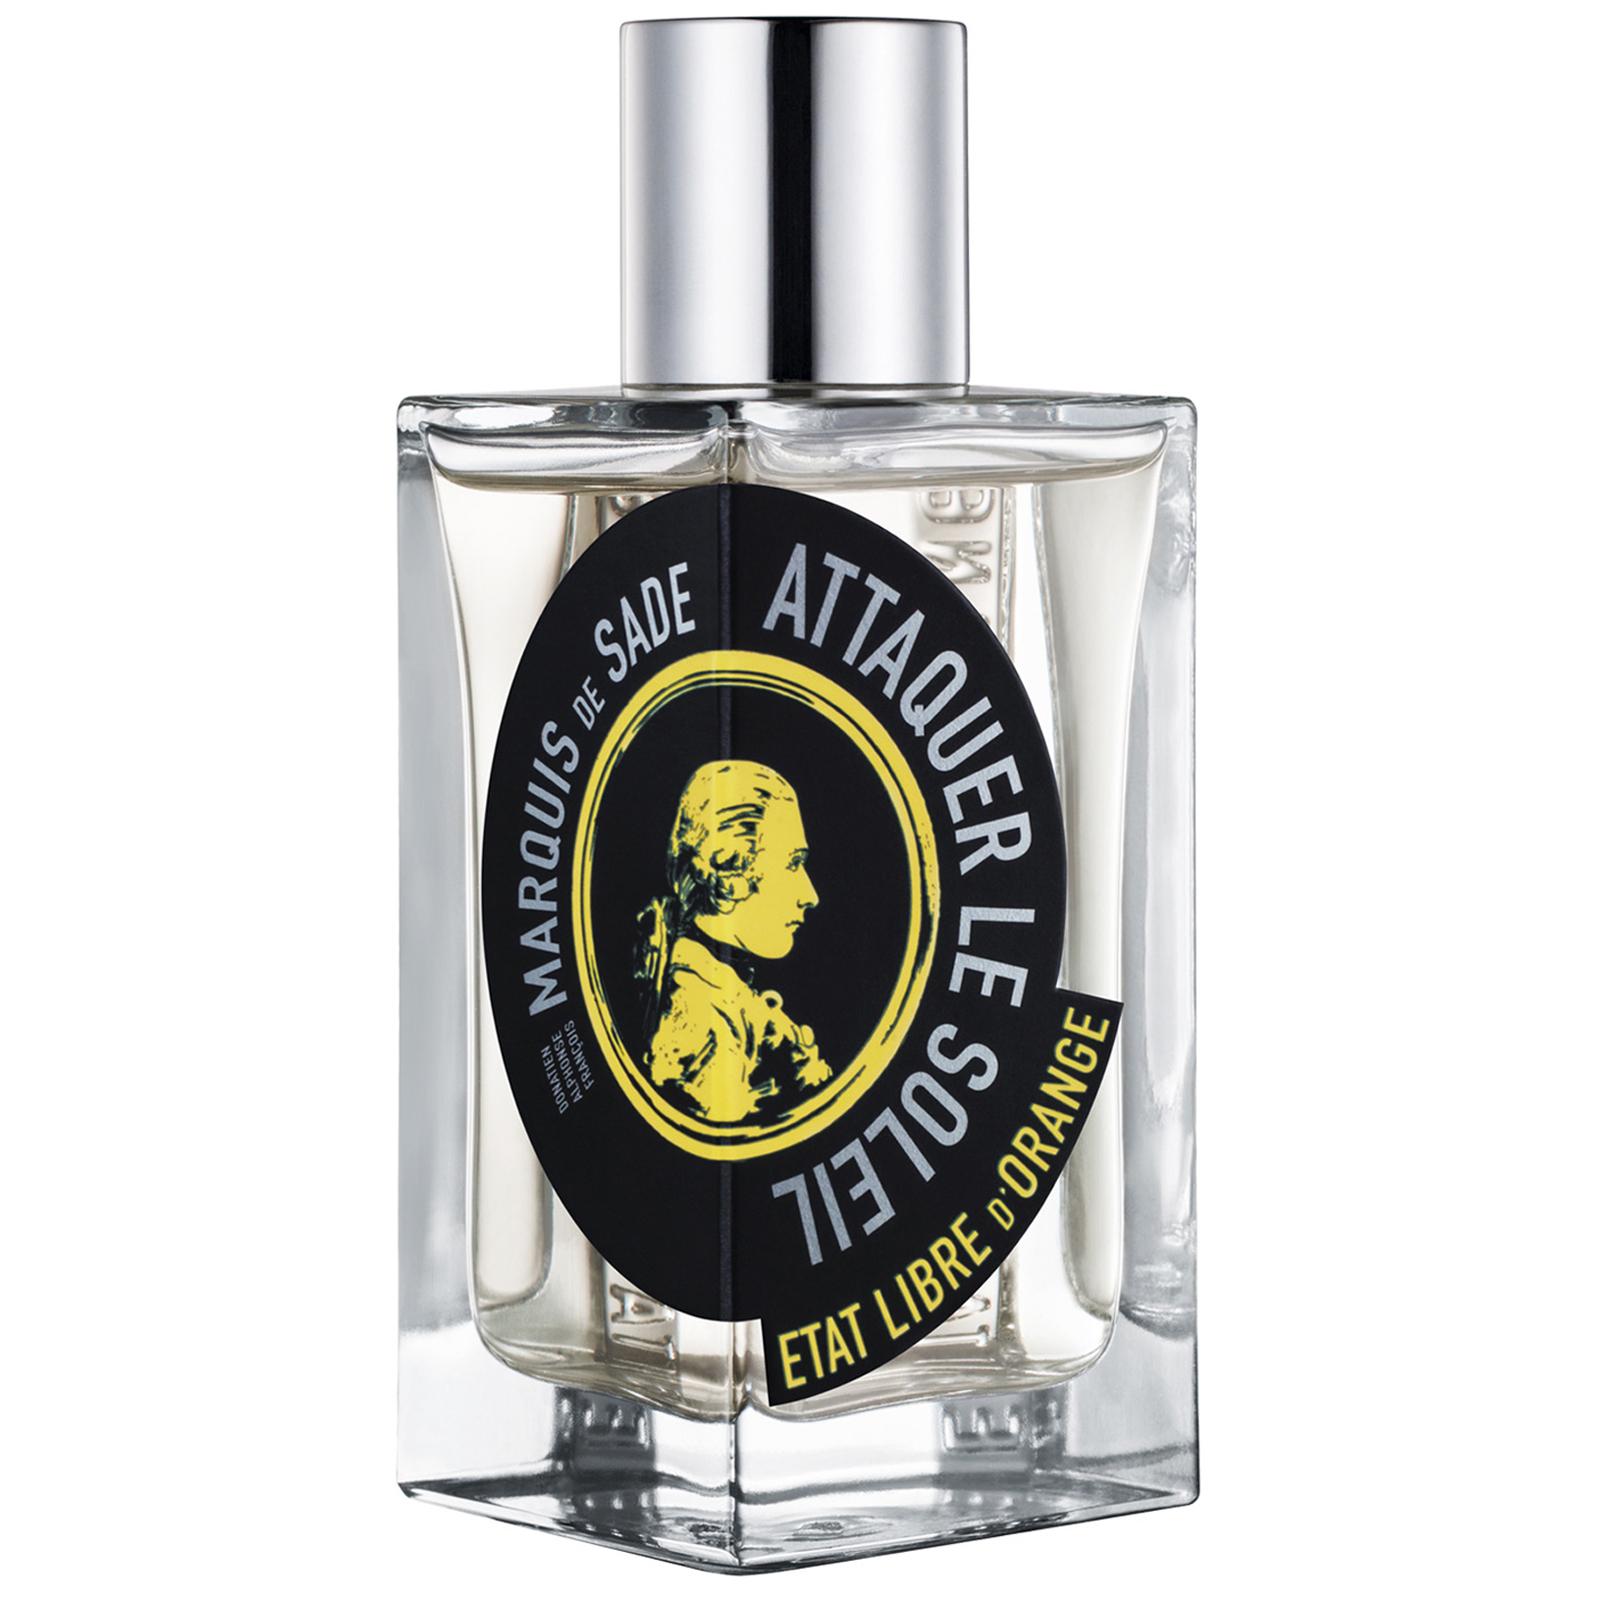 Attaquer le soleil marquis de sade profumo eau de parfum 100 ml